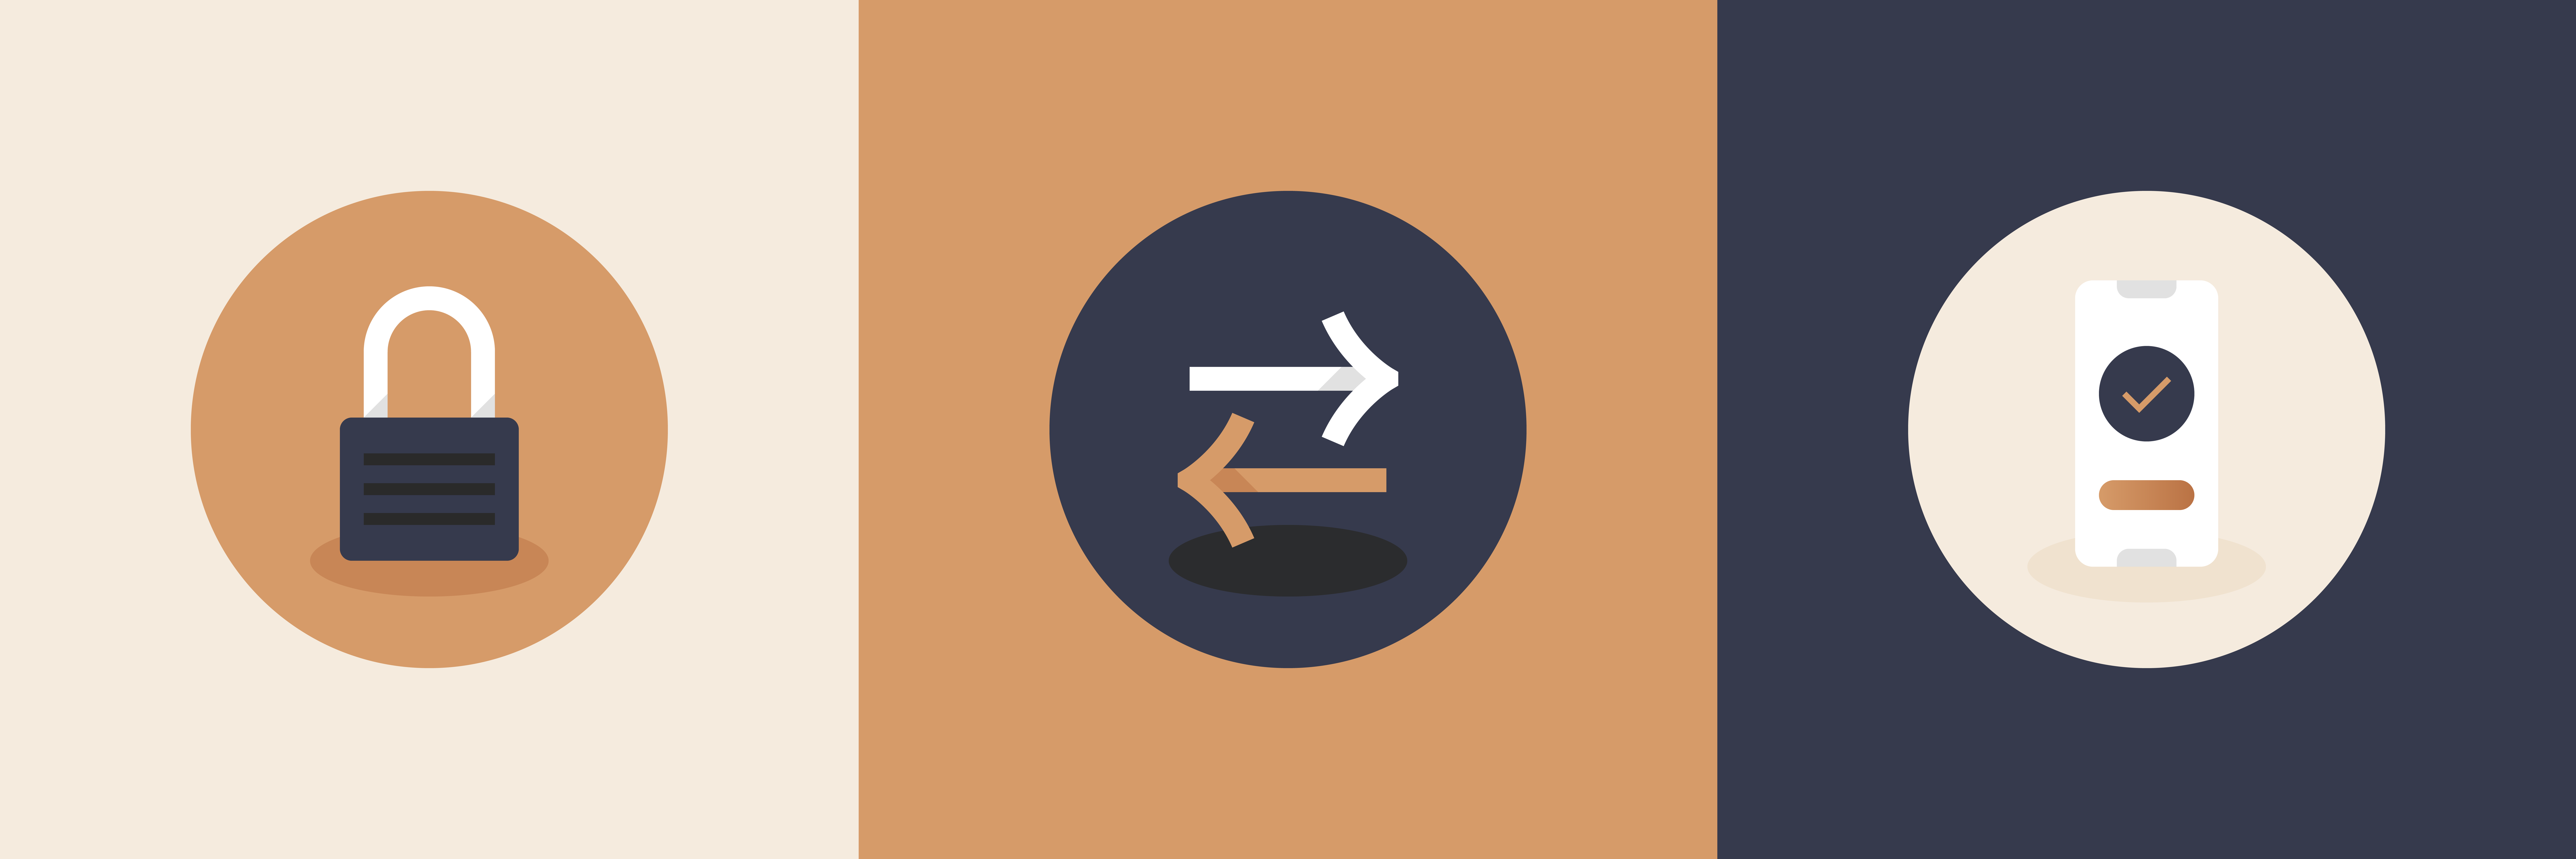 moneyclip-illustration-g